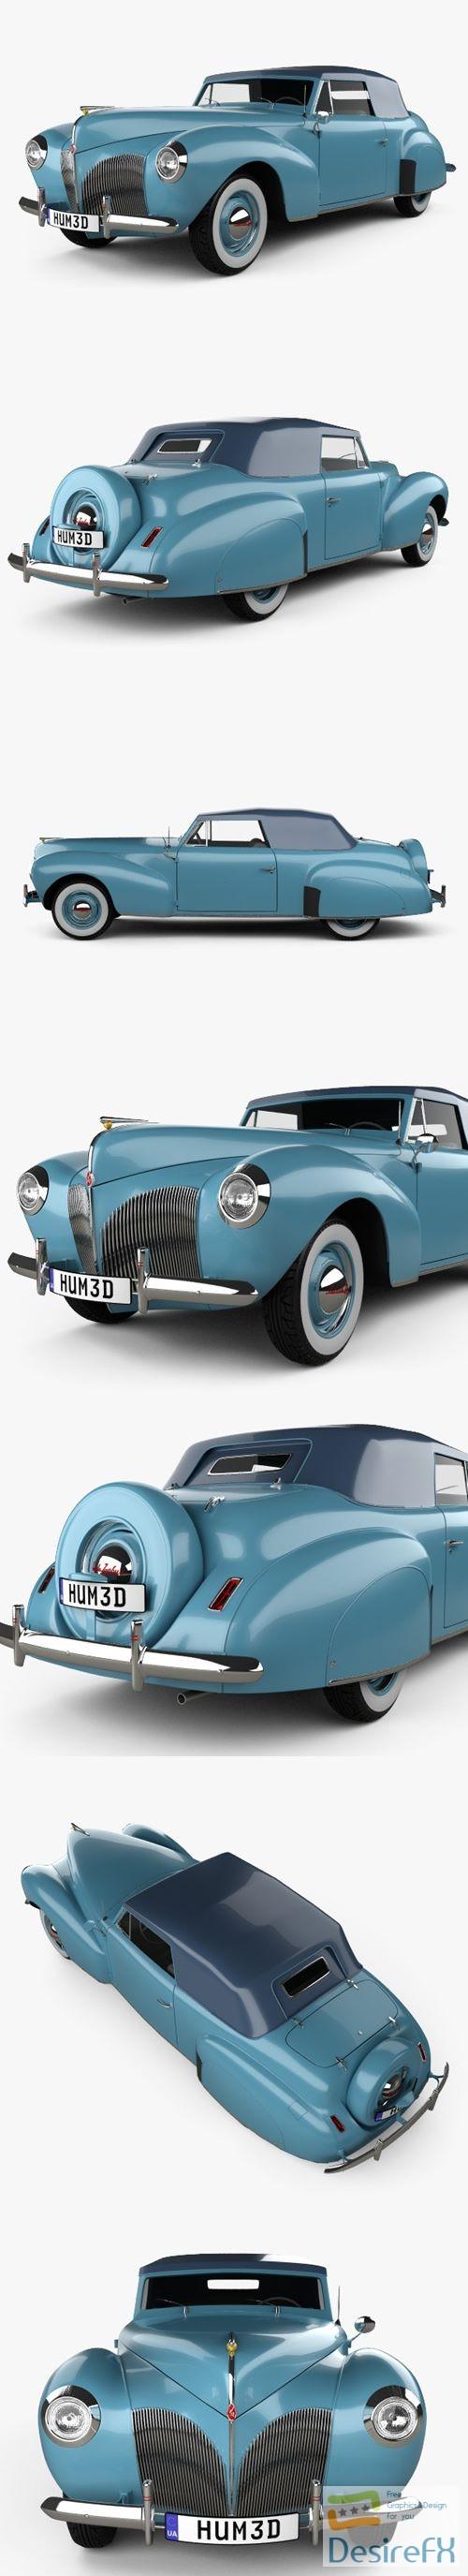 3d-models - Lincoln Zephyr Continental Cabriolet 1939 3D Model